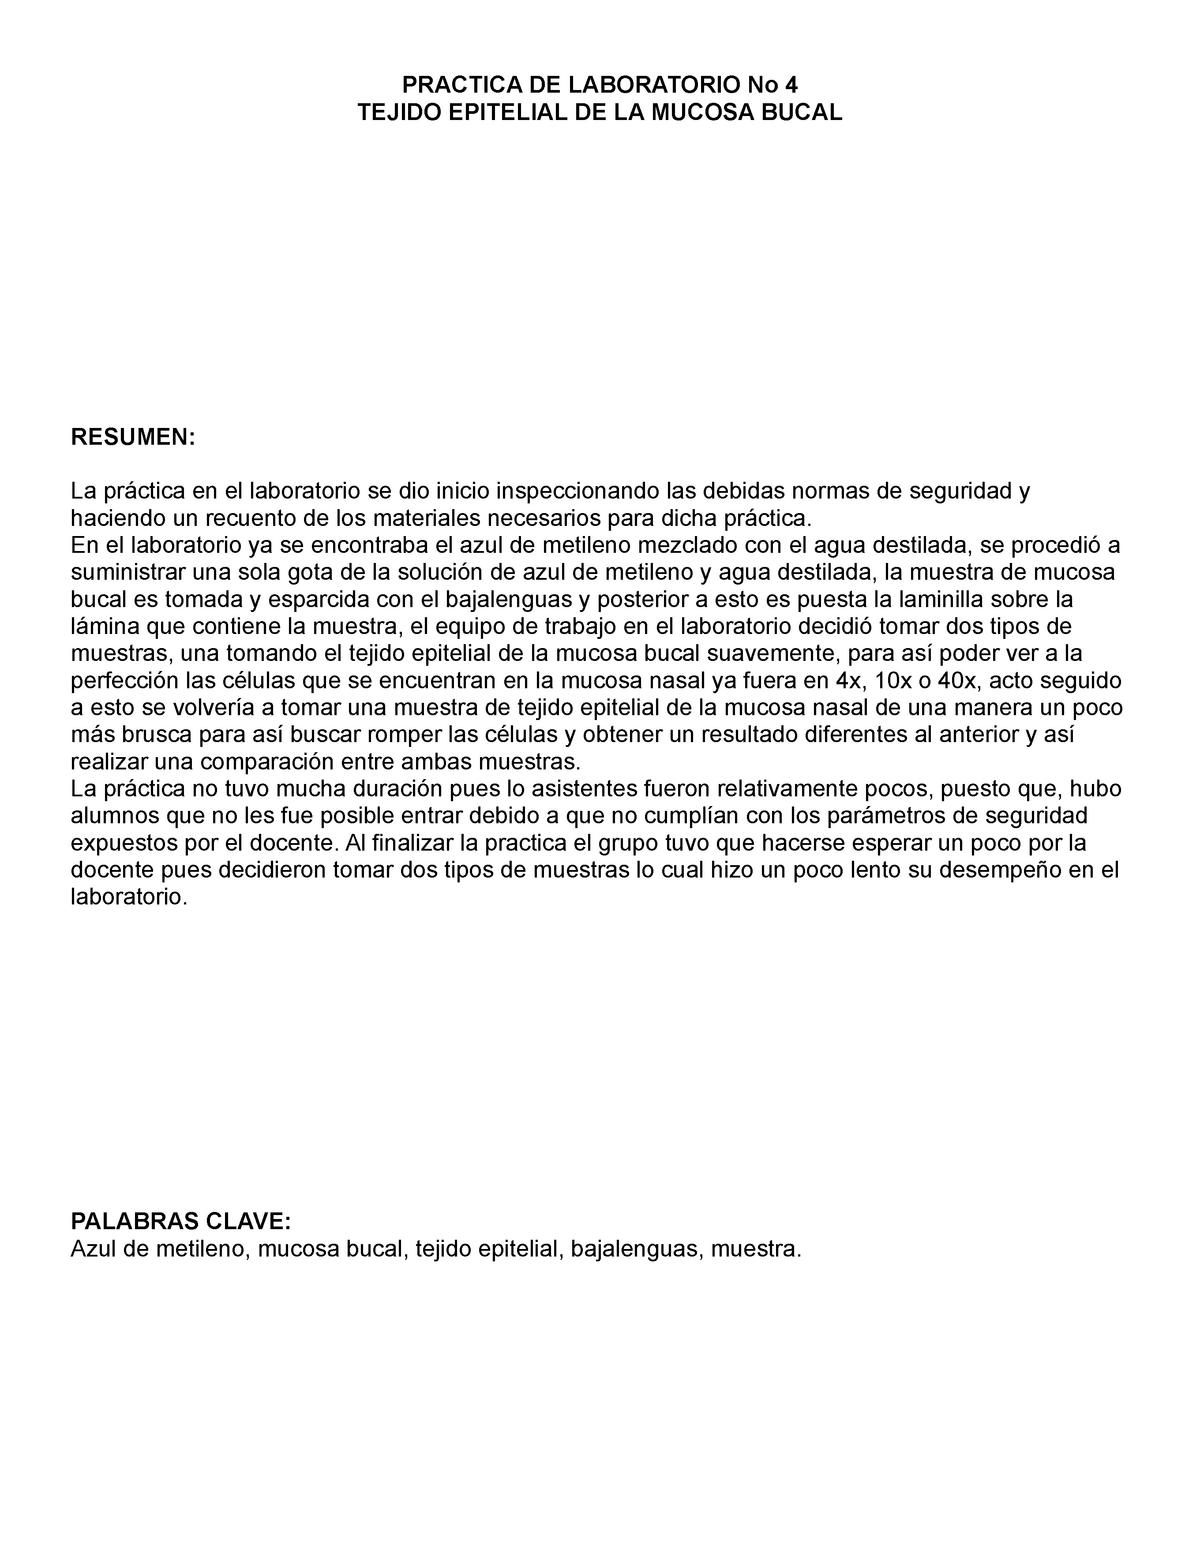 Celulas De La Mucosa Bucal Biología General Udec Studocu